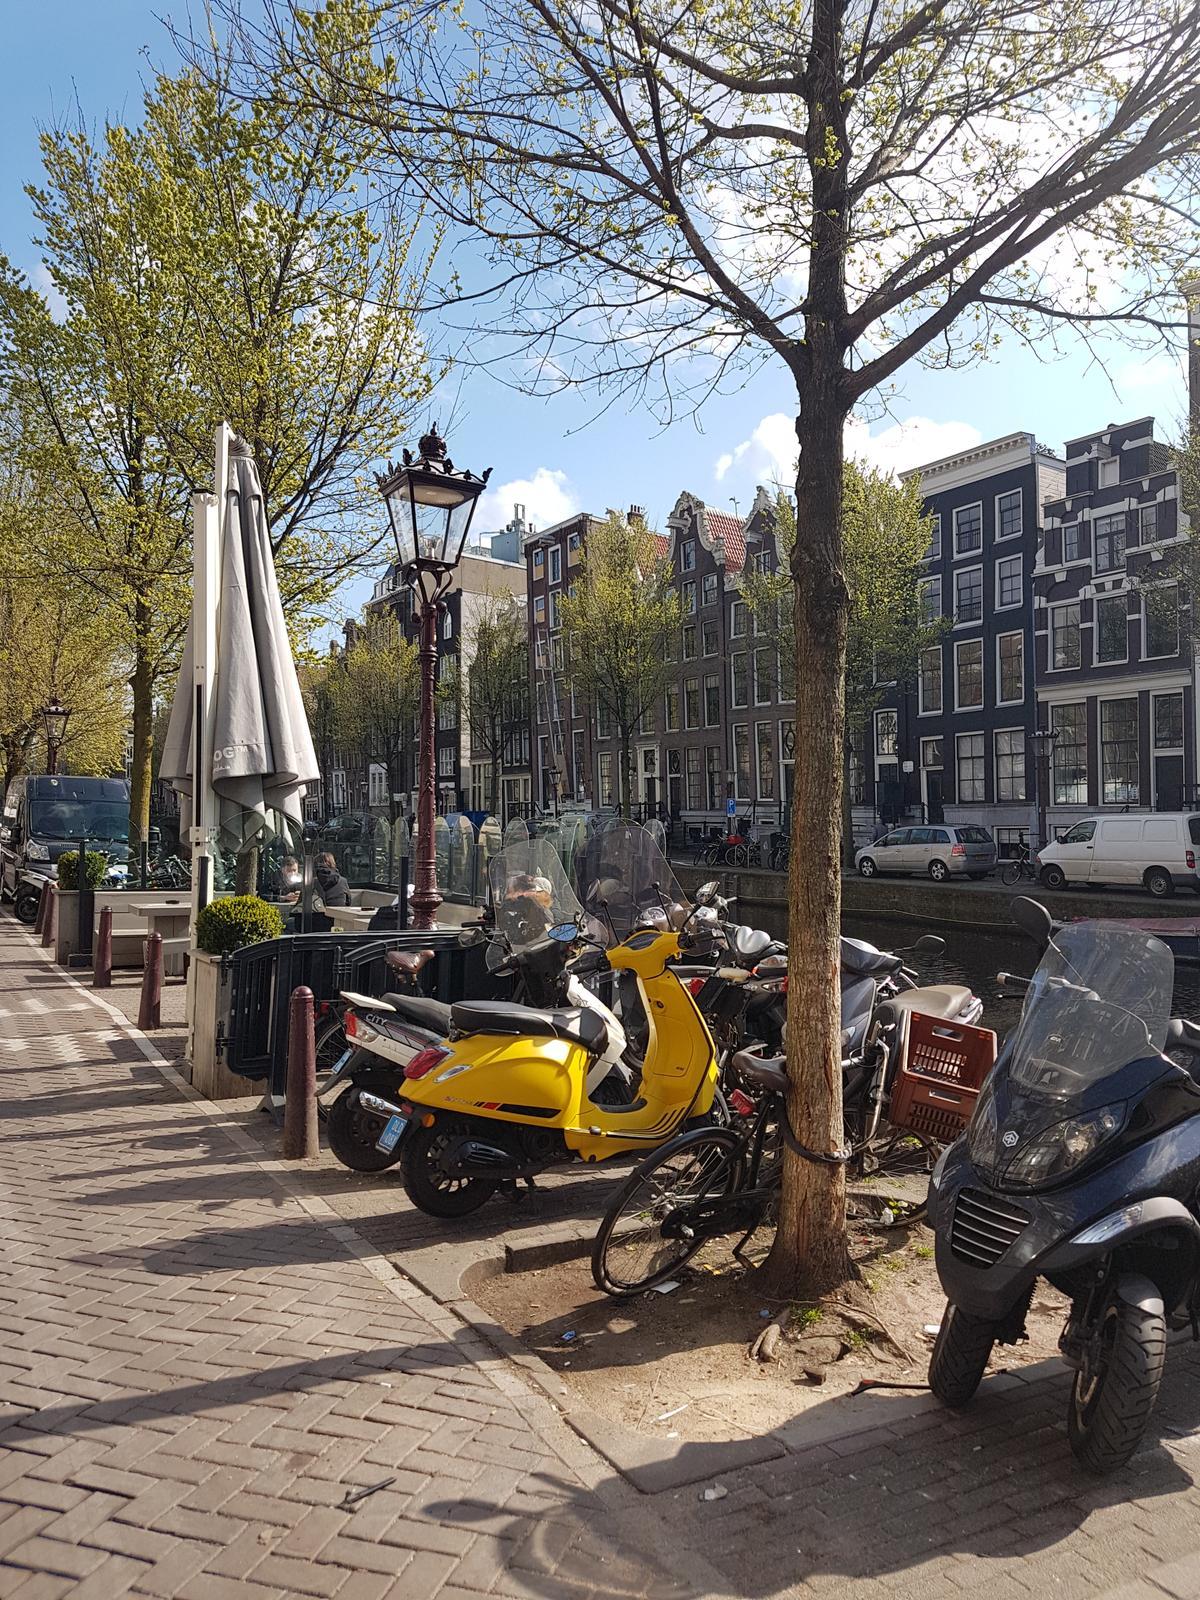 Holandsko - Obrázek č. 19